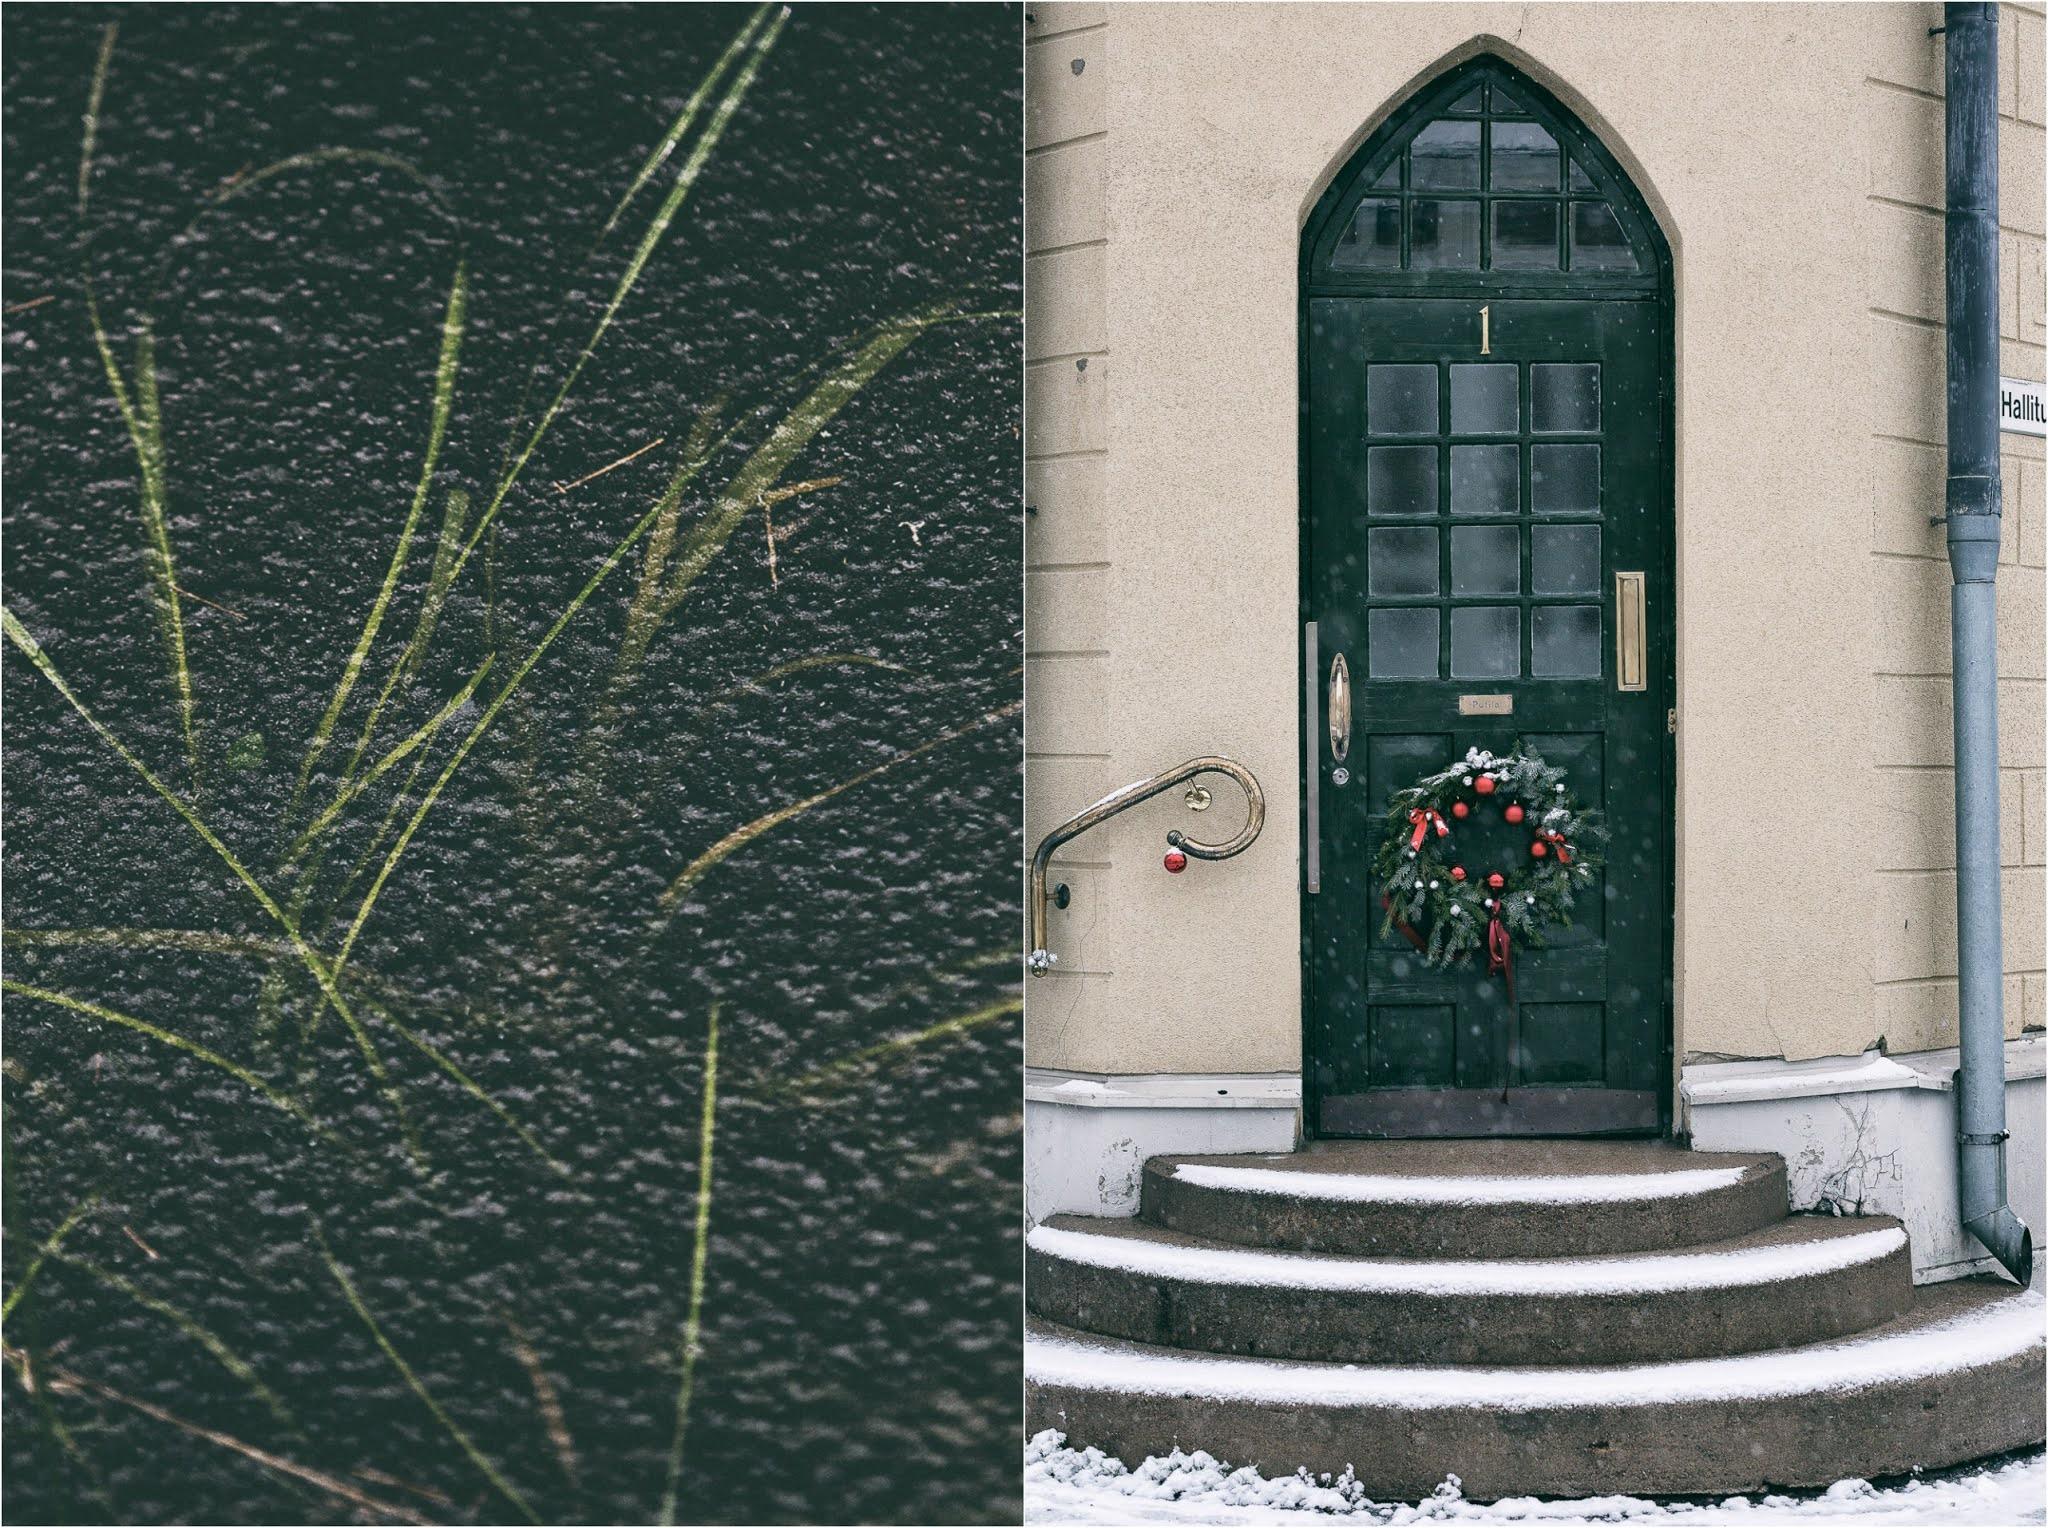 talvi, uusivuosi, Pori, Visitpori, rakastu poriin, valokuvaaja, visualaddict, visualaddictfrida, photographer, Frida Steiner